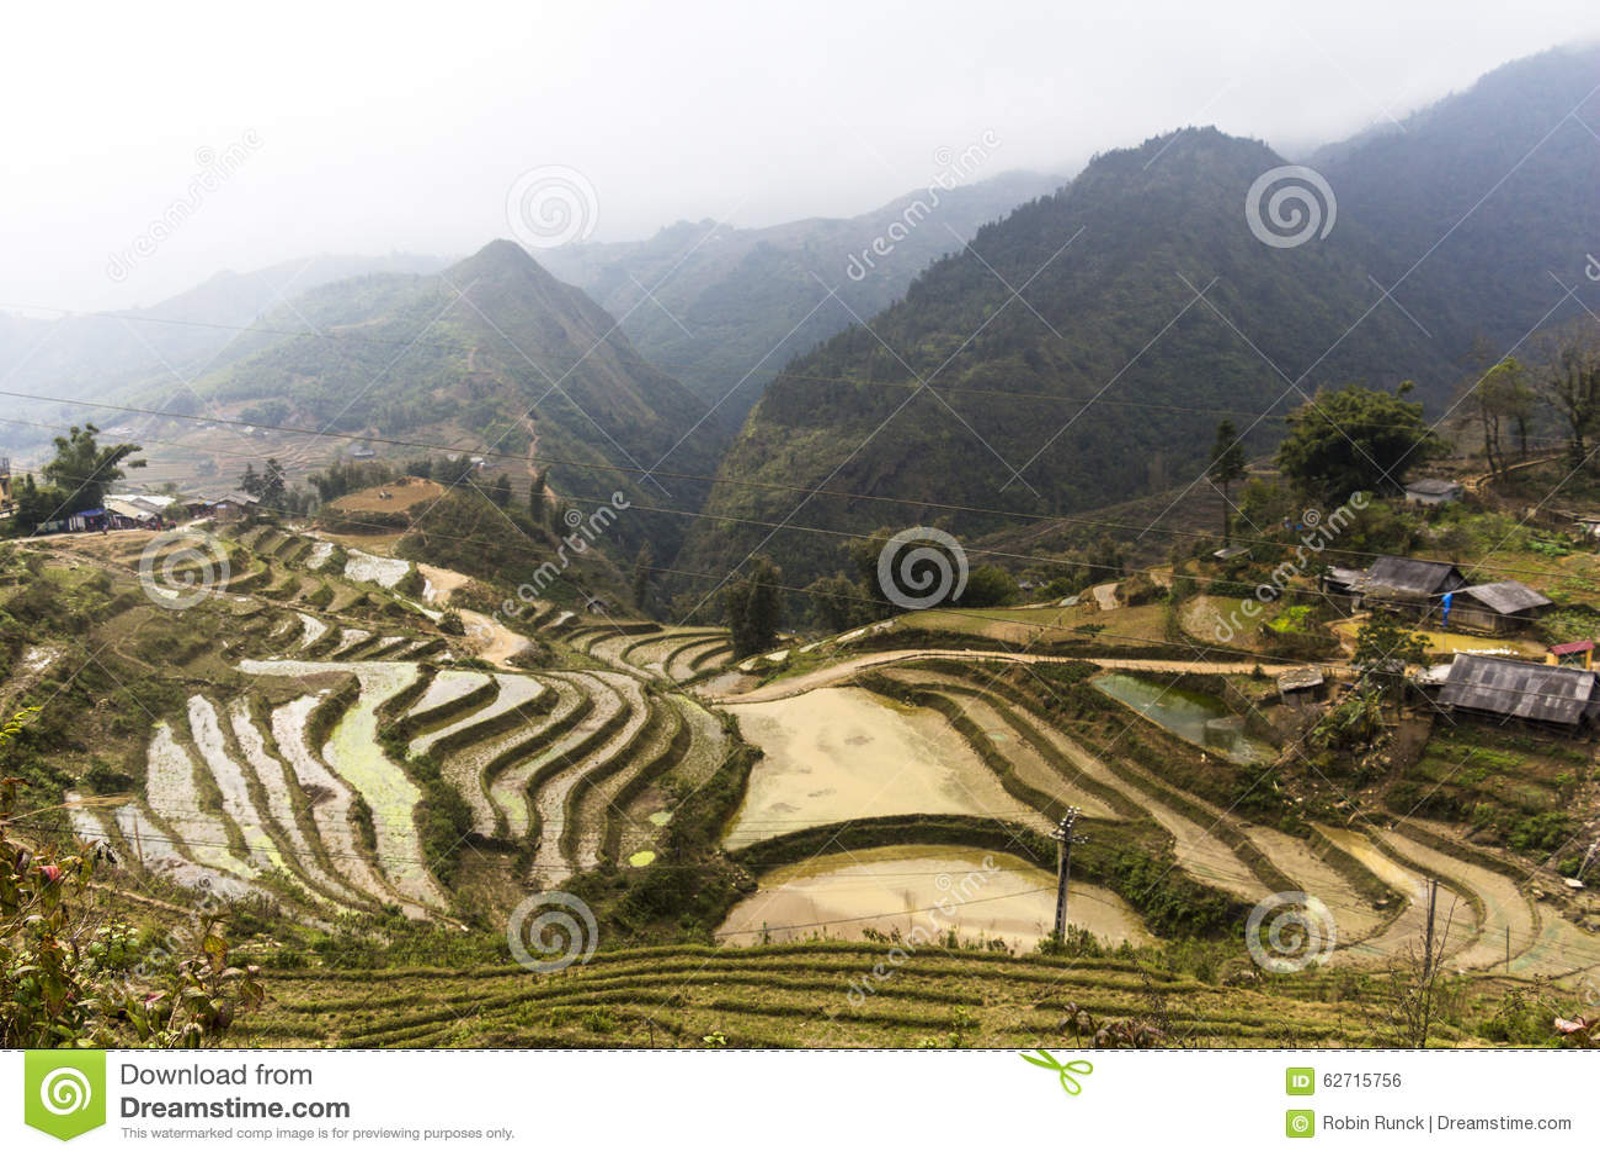 Download Αγροτικό τοπίο Sa PA, Βιετνάμ Στοκ Εικόνες - εικόνα από πράσινος, λόφος: 62715756